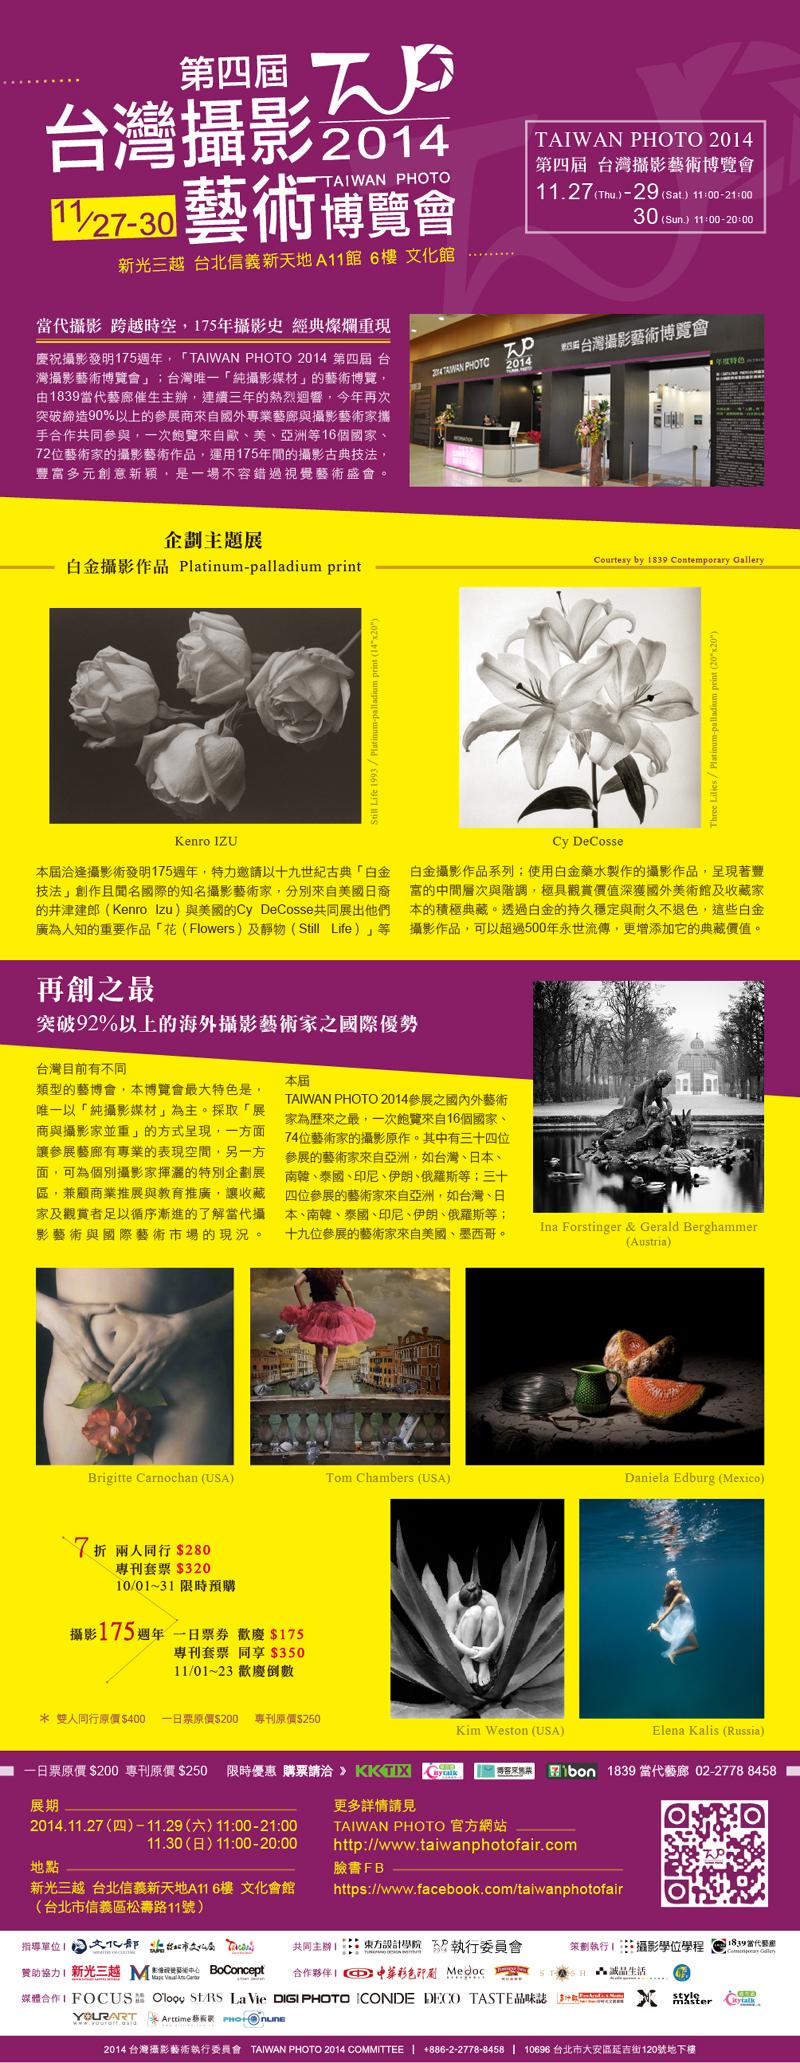 2014TWP_10 press